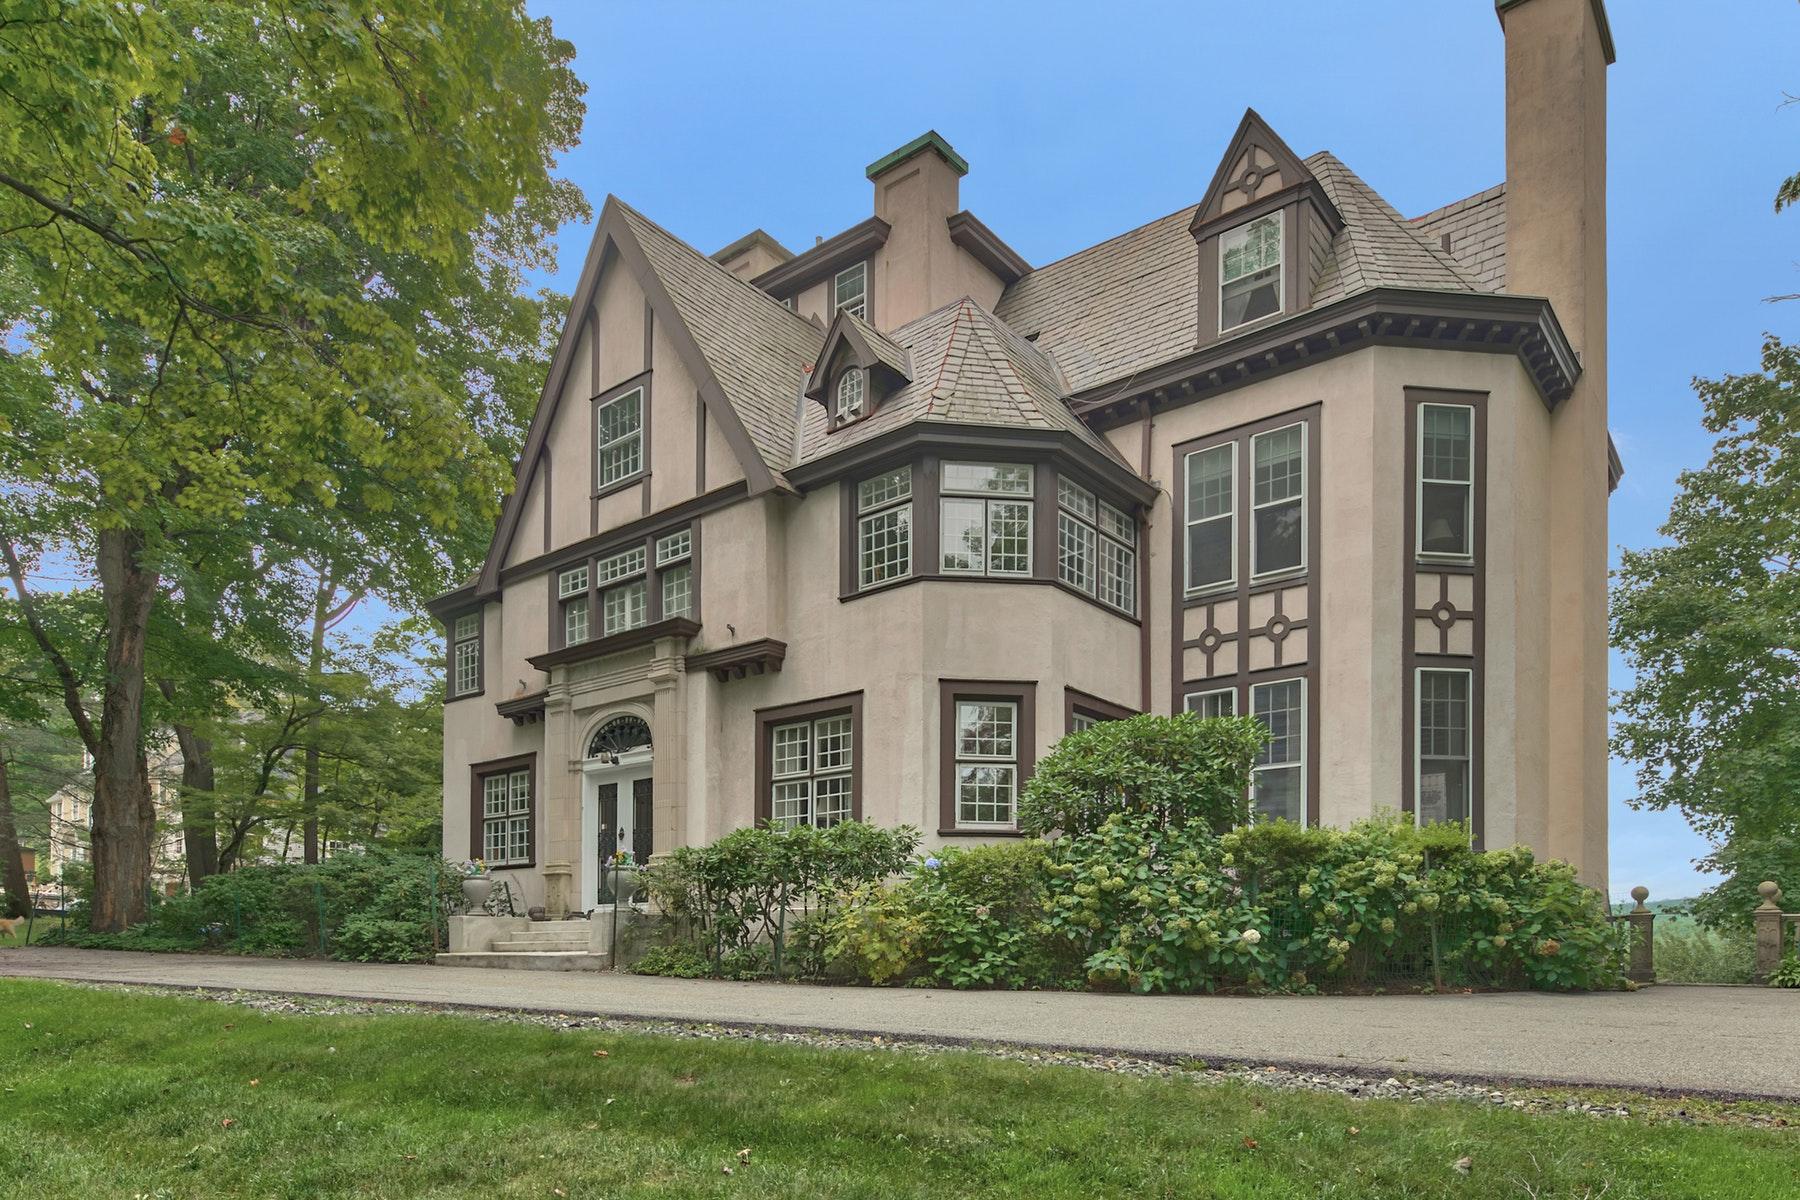 Single Family Homes for Active at Van Buren House 24 Tower Hill Road E Tuxedo Park, New York 10987 United States